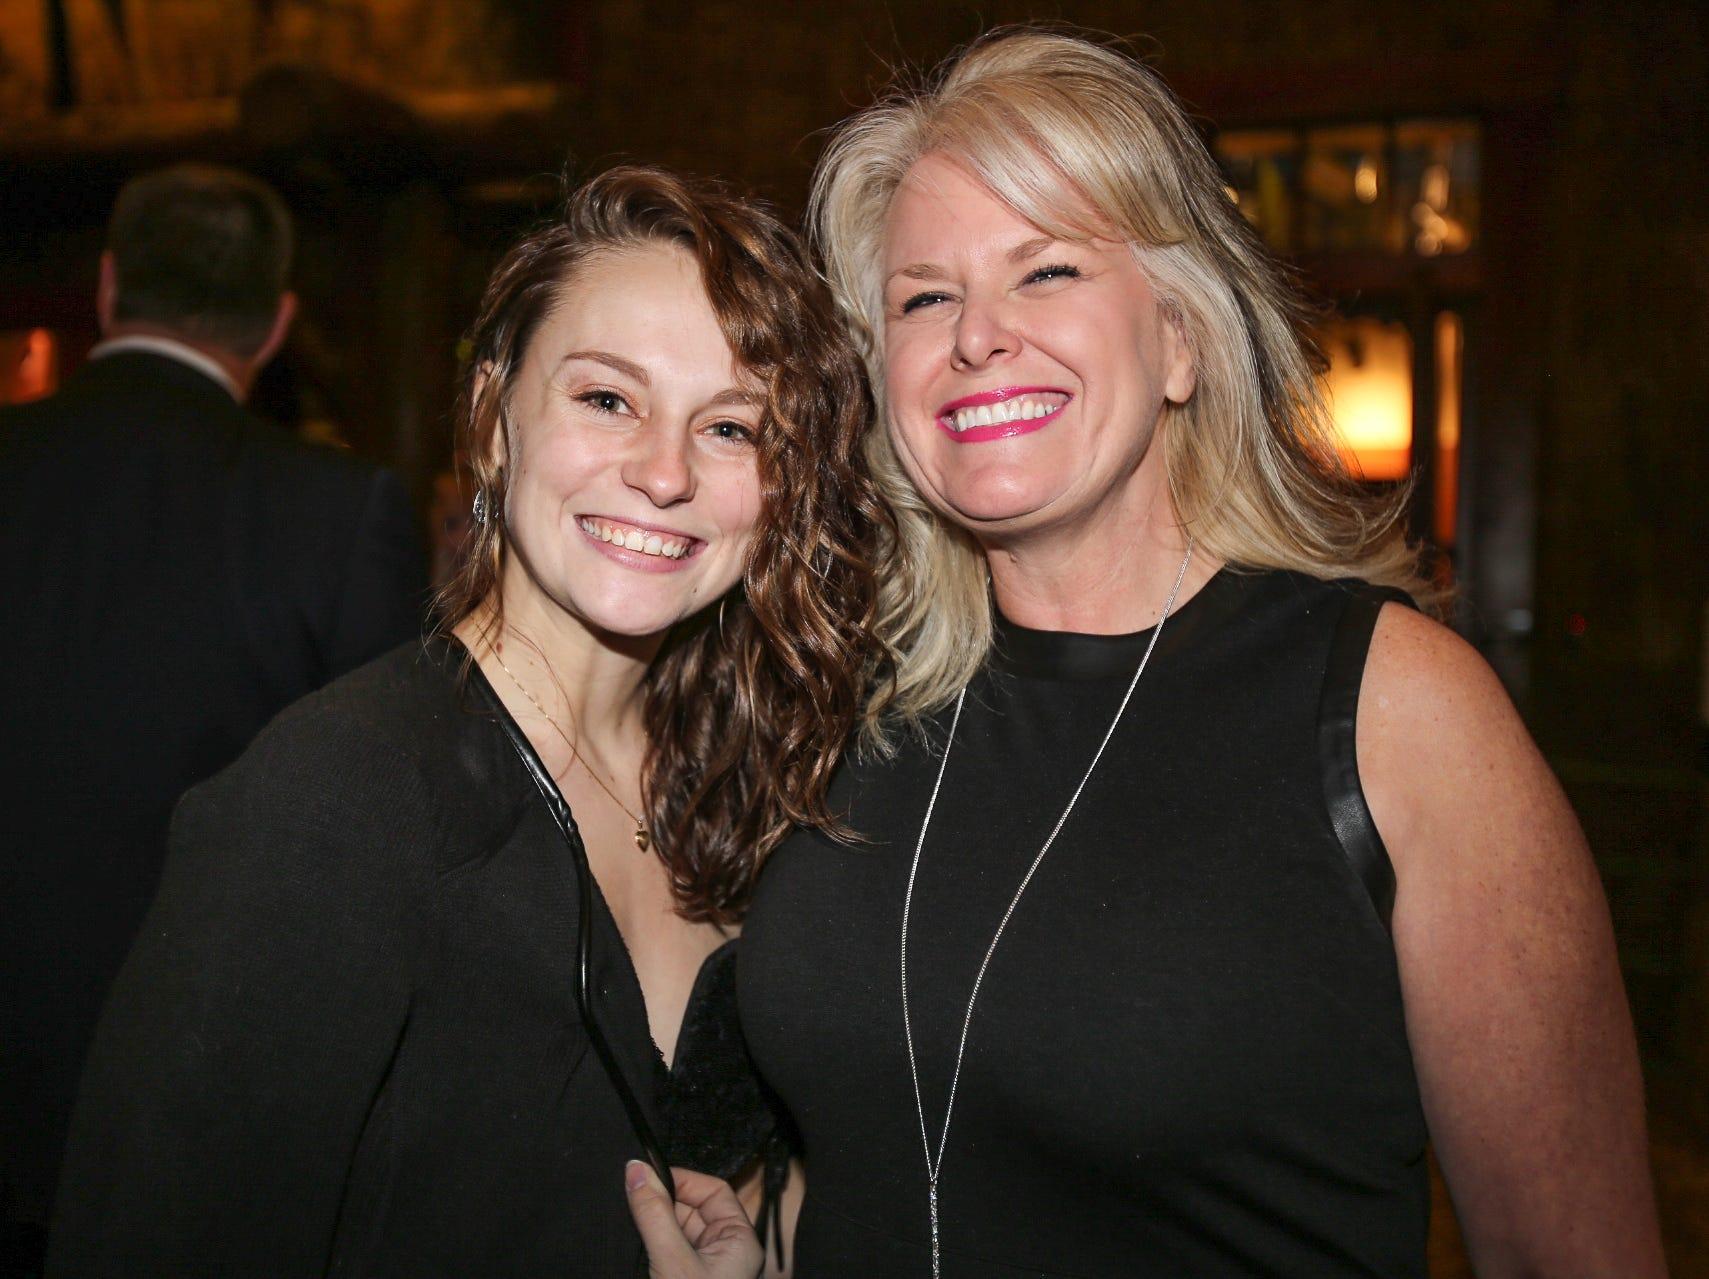 Bailie Robinson and Kirsten Adams